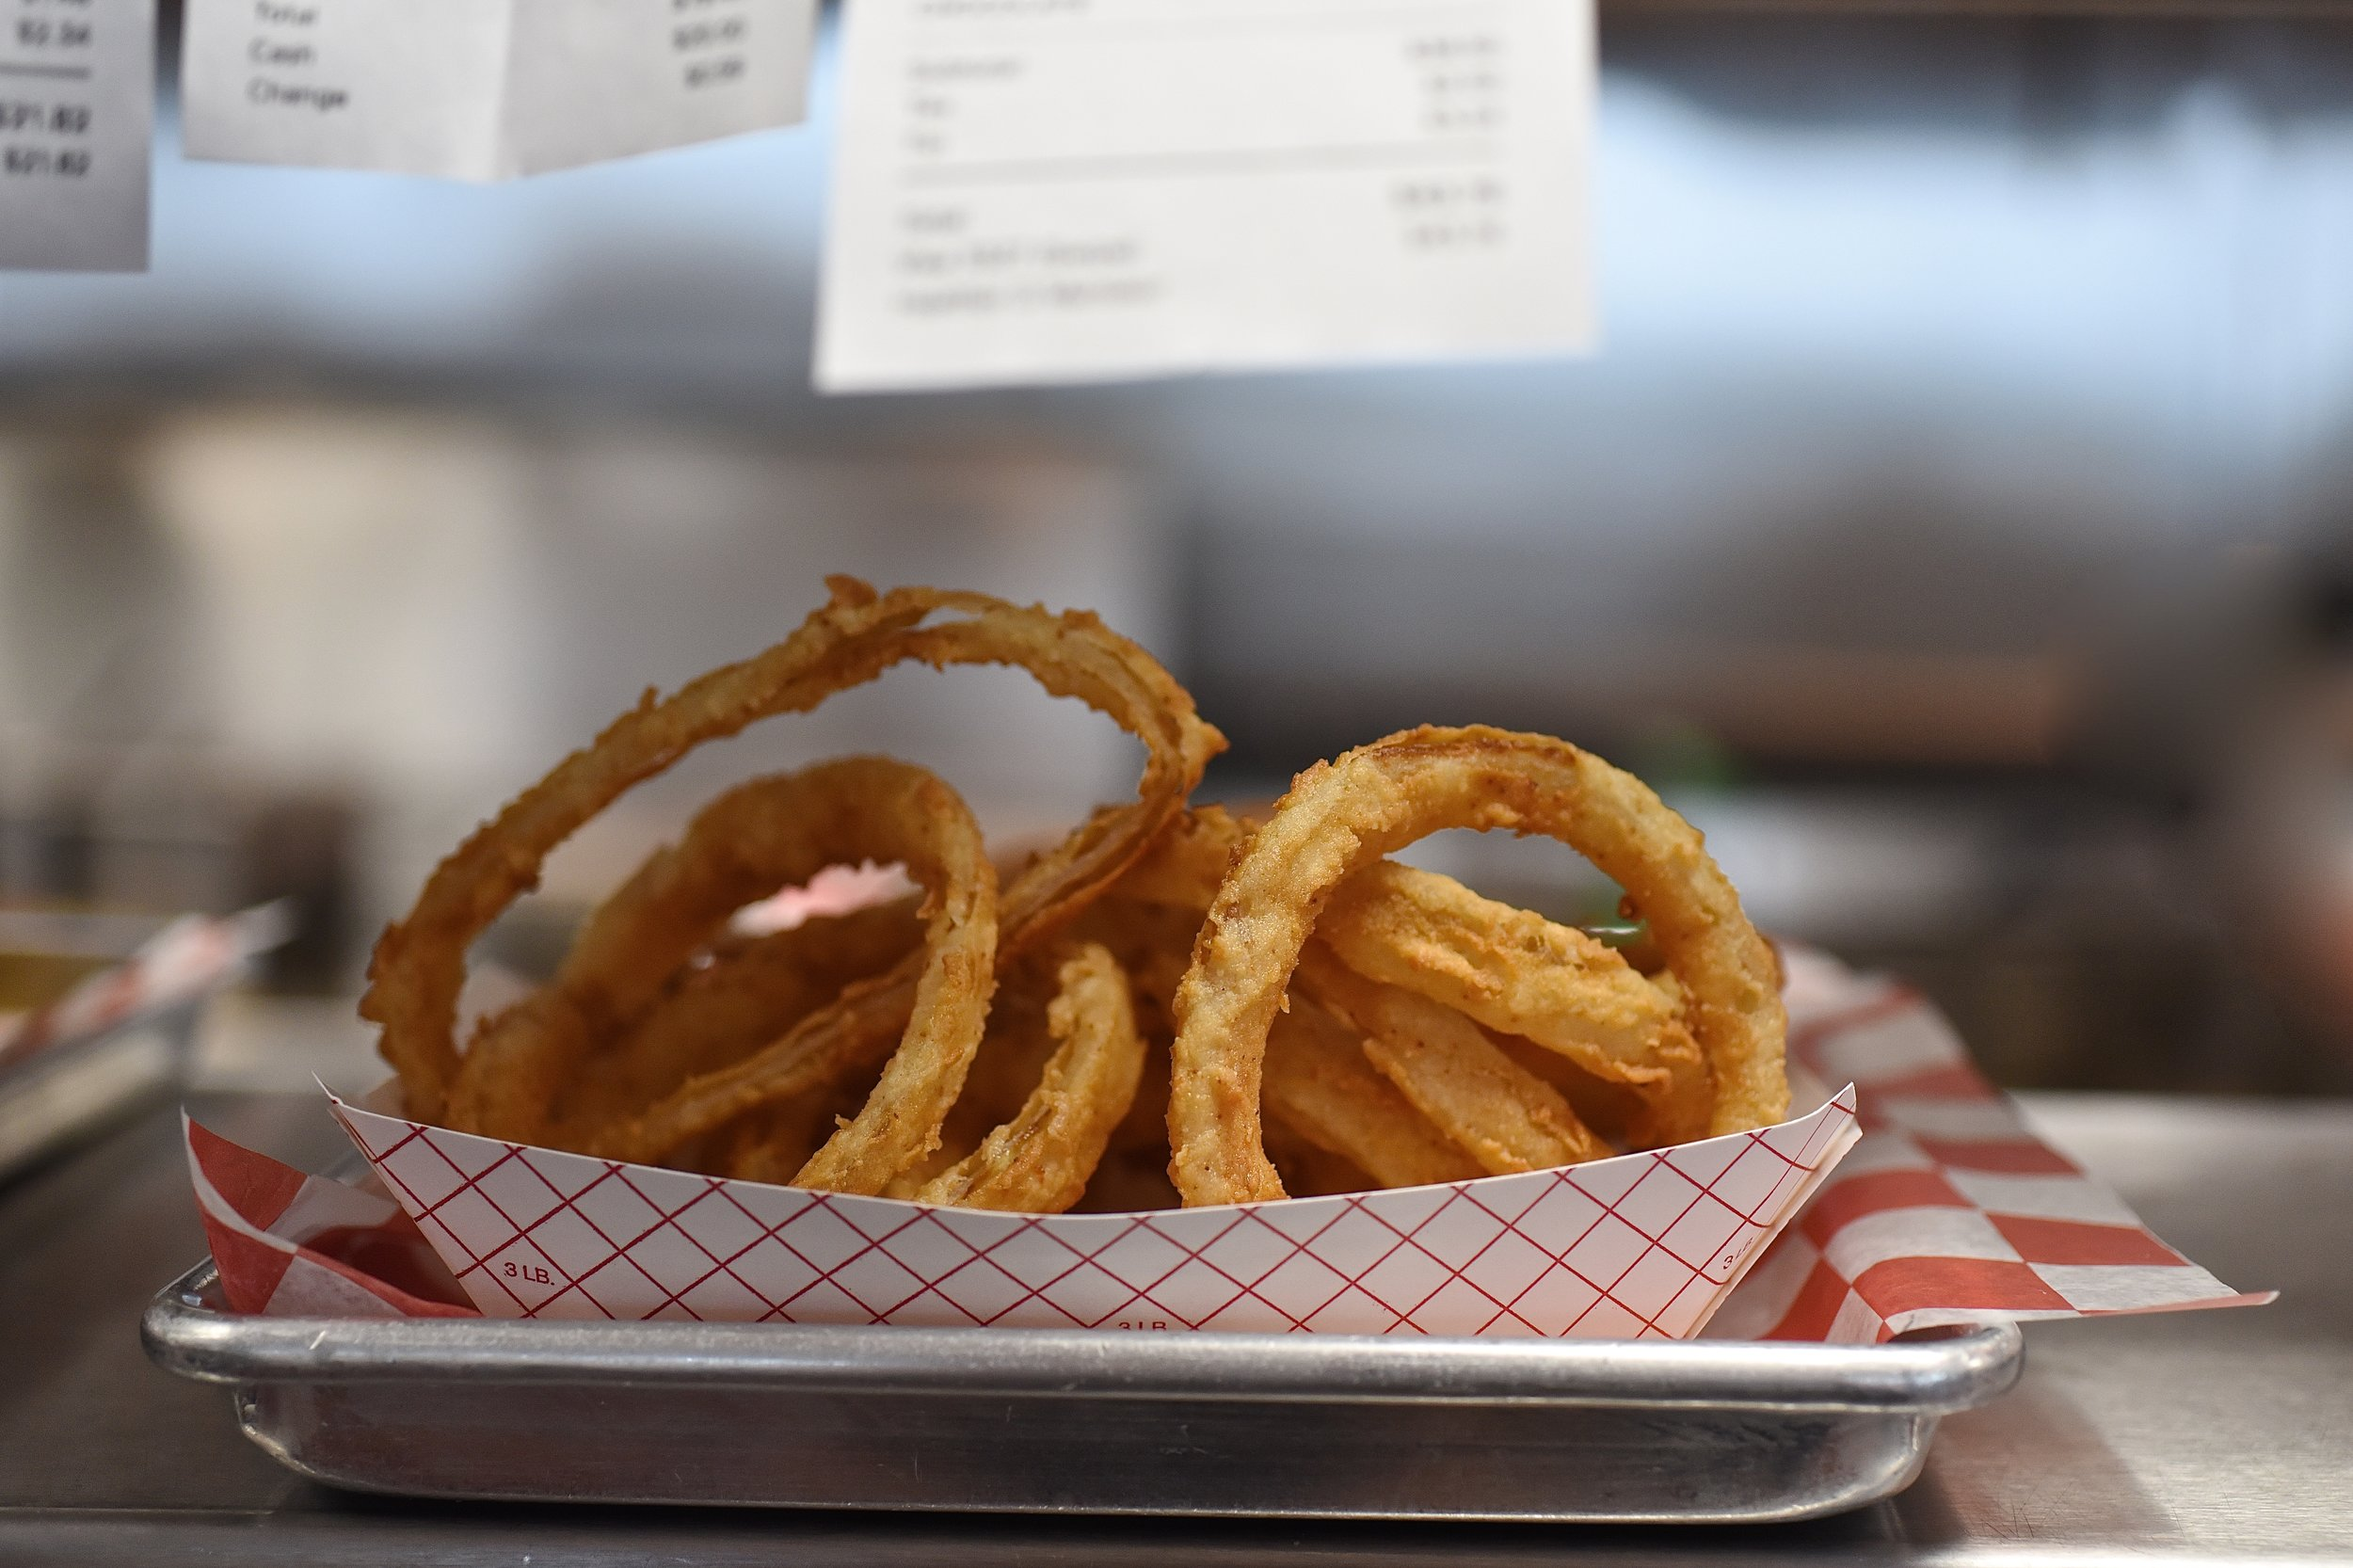 Onion Rings by Kimberly Park (2).JPG